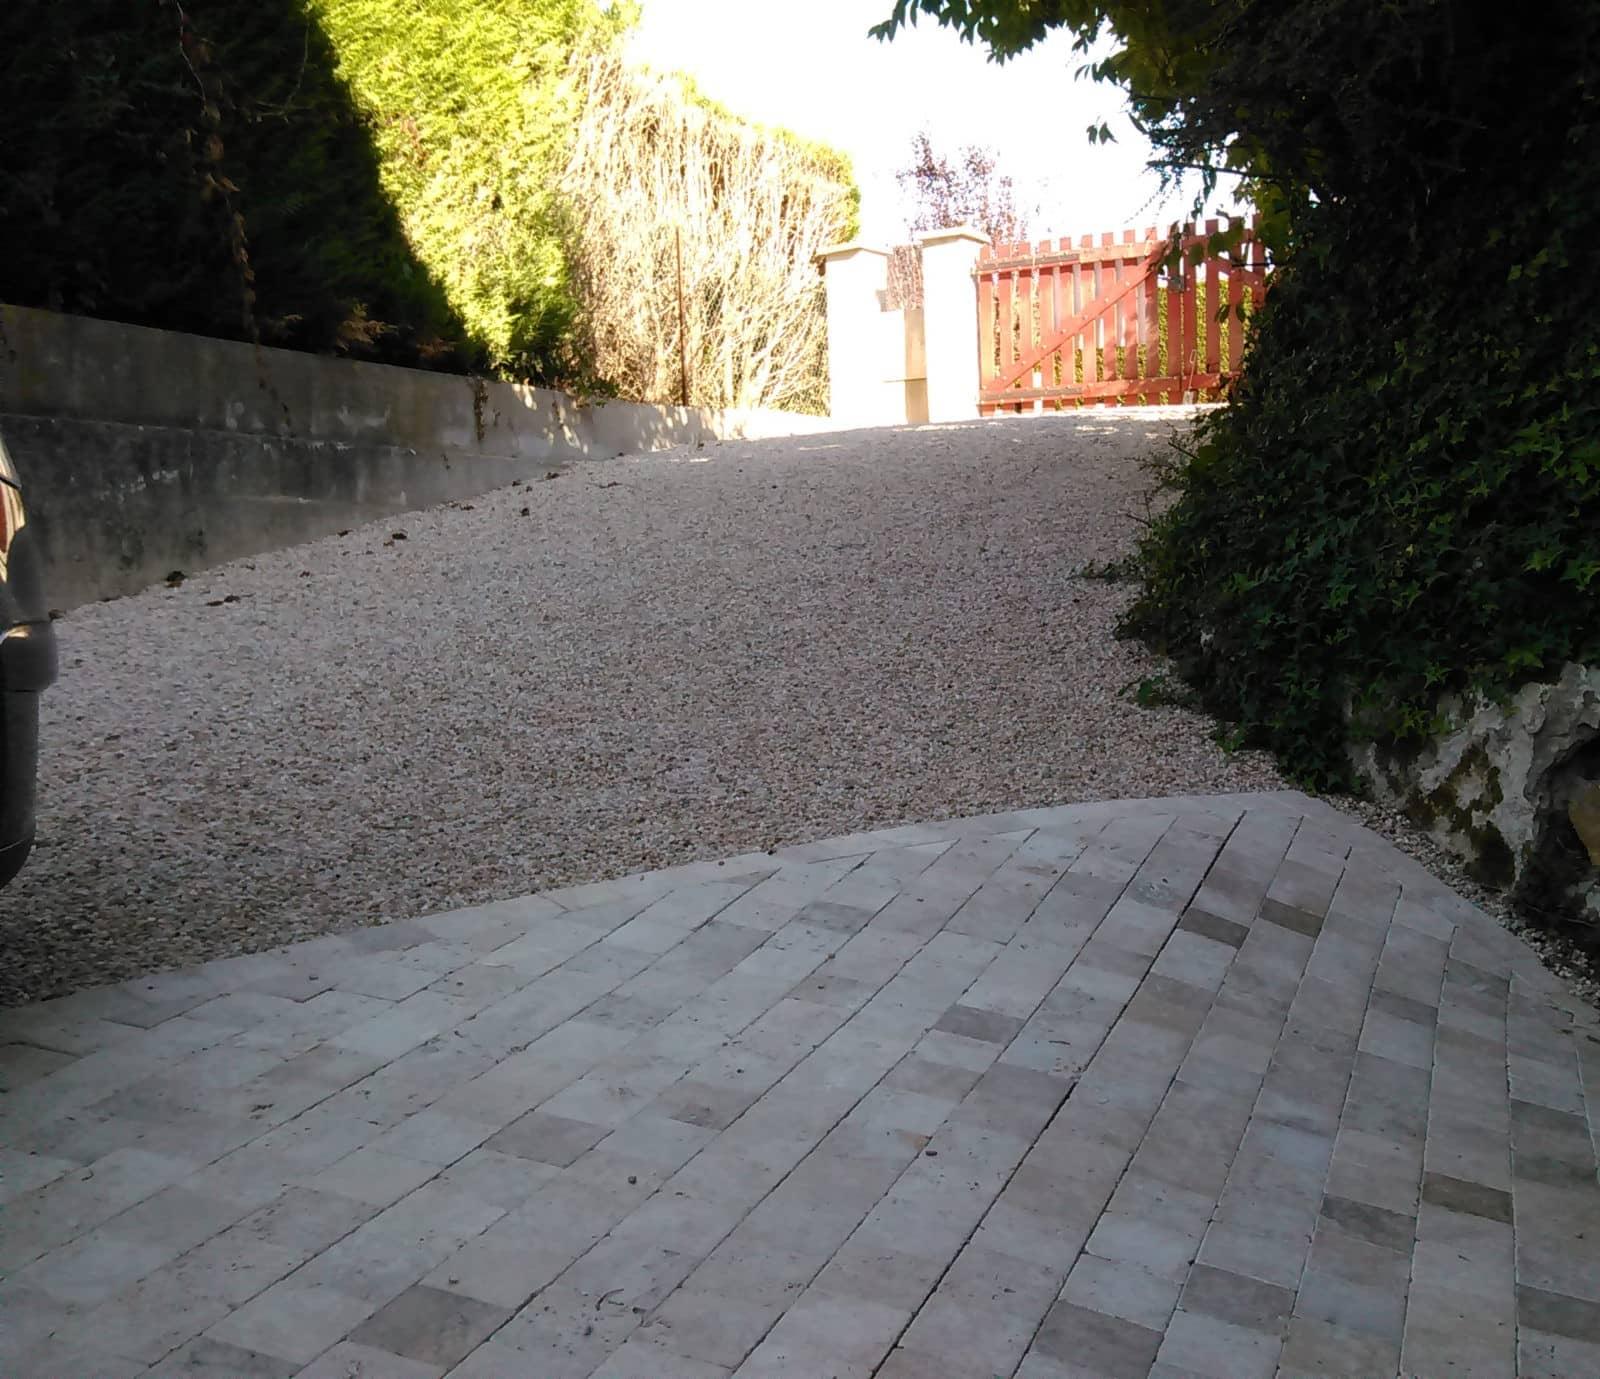 Allee De Jardin En Pente aménagement d'allée en pente (voiture, jardin) - lantana